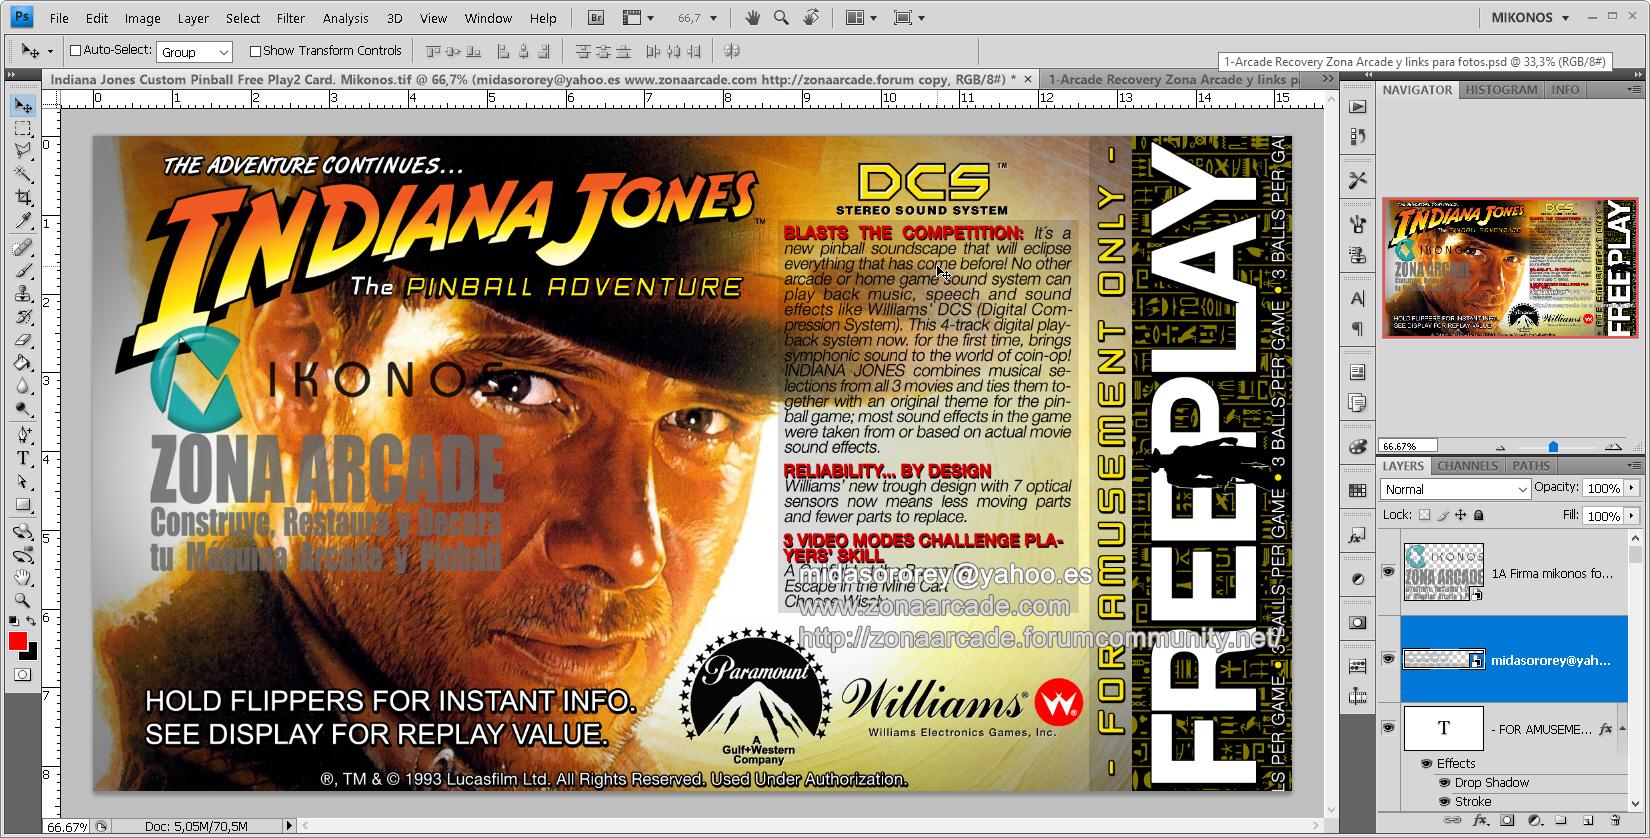 Indiana-Jones-Custom-Pinball-Card-Free Play-Mikonos1